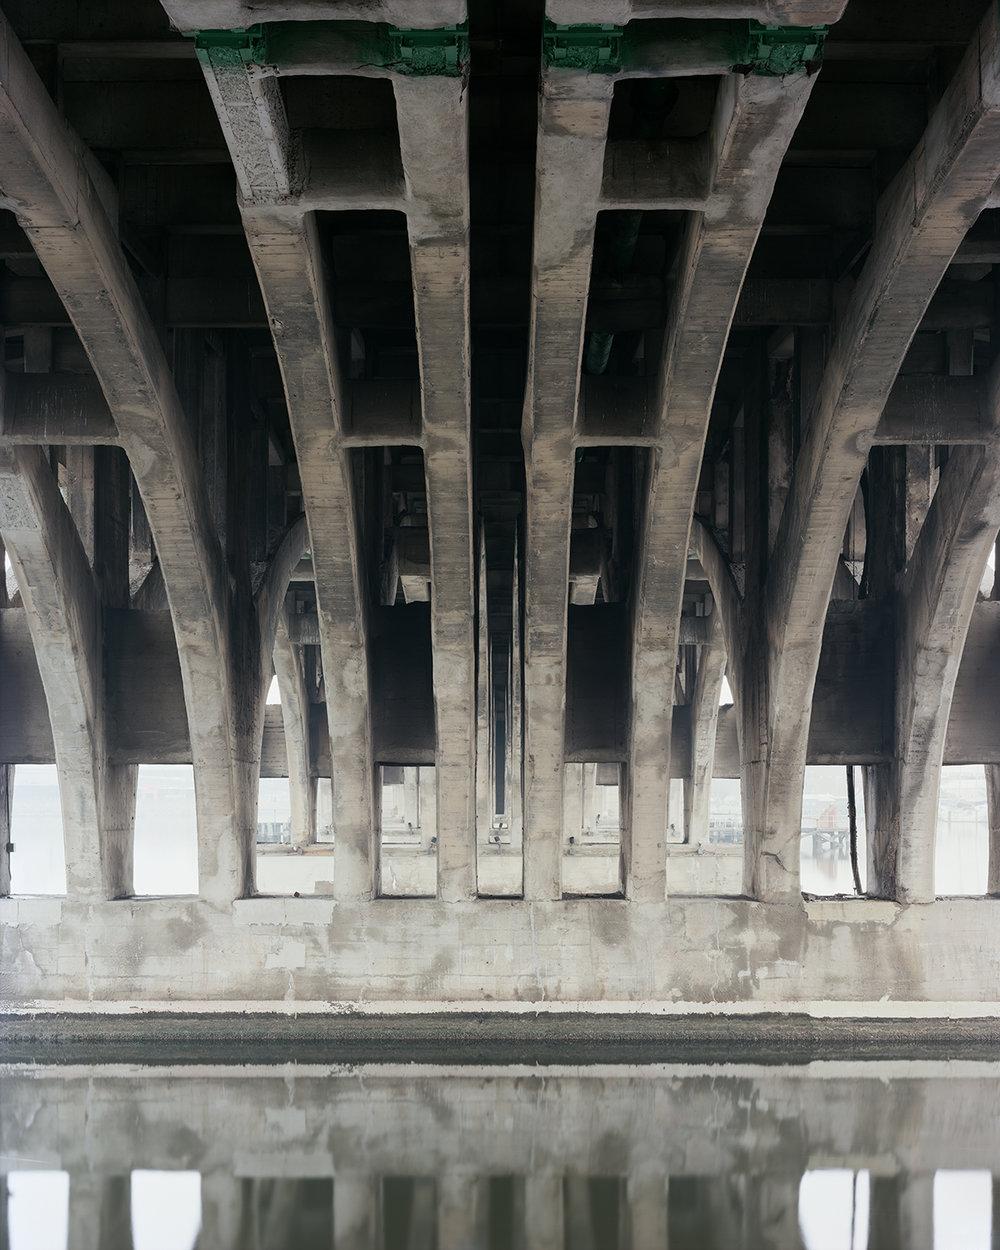 Hanover Street Bascule Bridge, Baltimore, MD